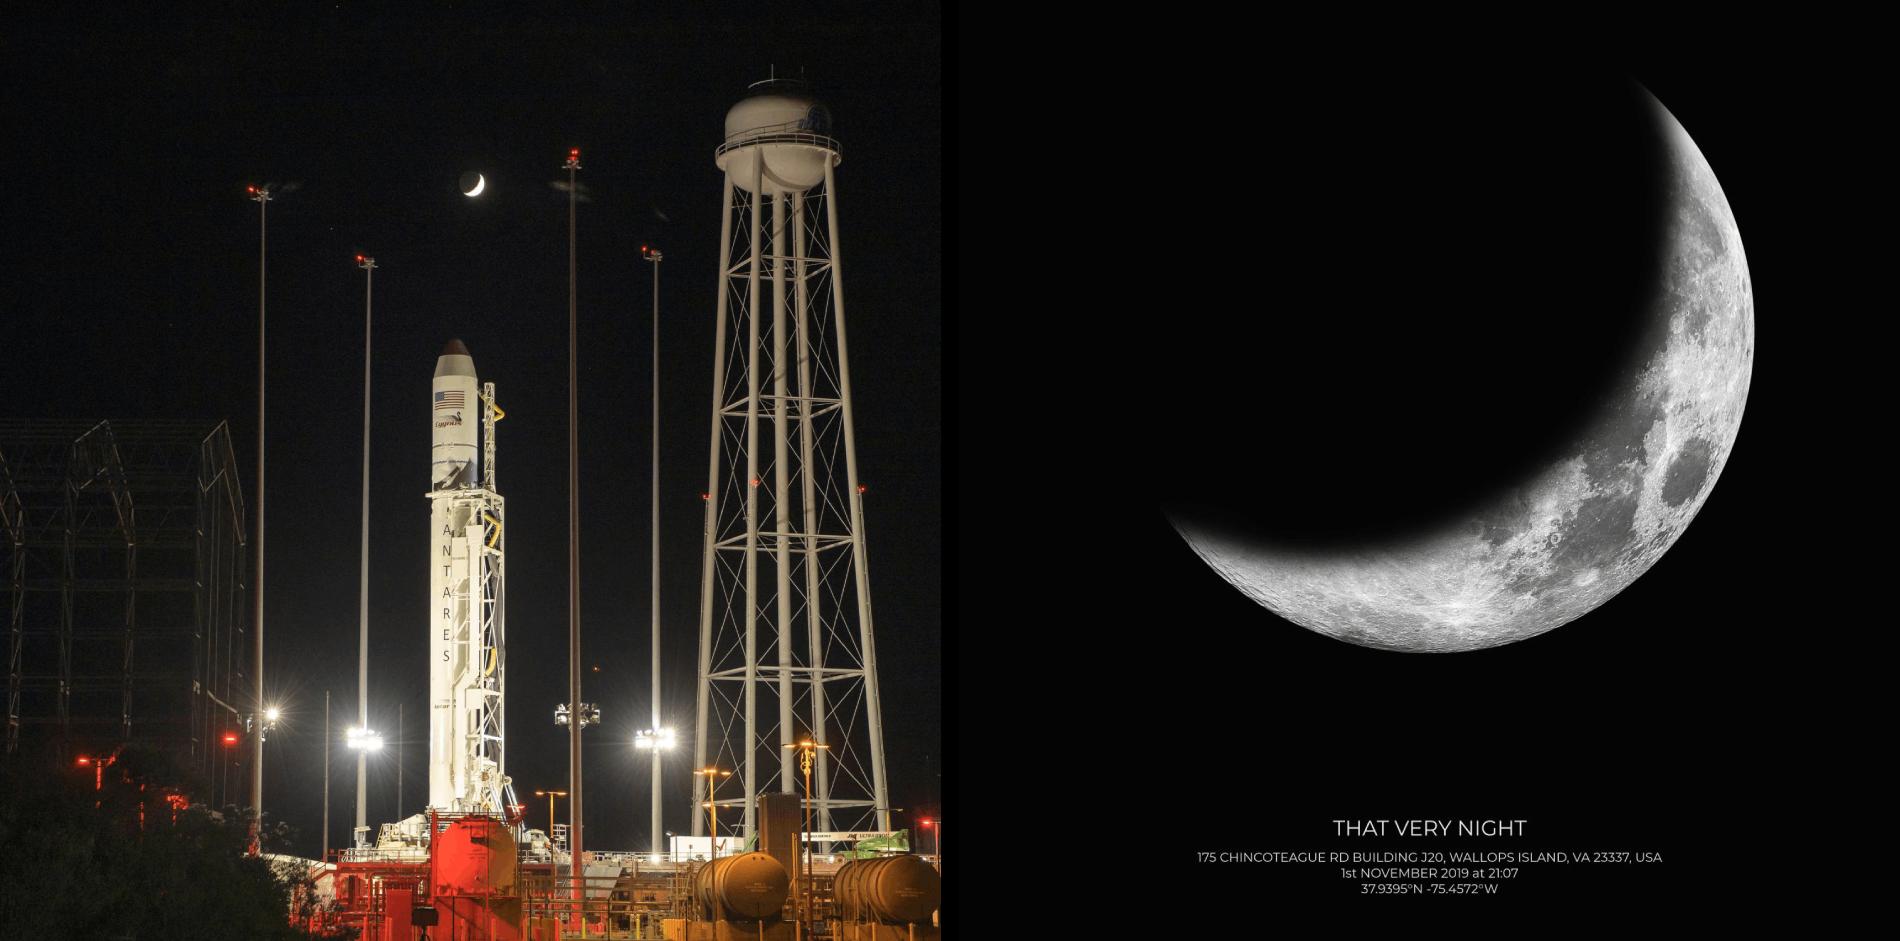 NASA's Wallops Flight Facility in Wallops Island on Friday, Nov. 1, 2019 moon phase